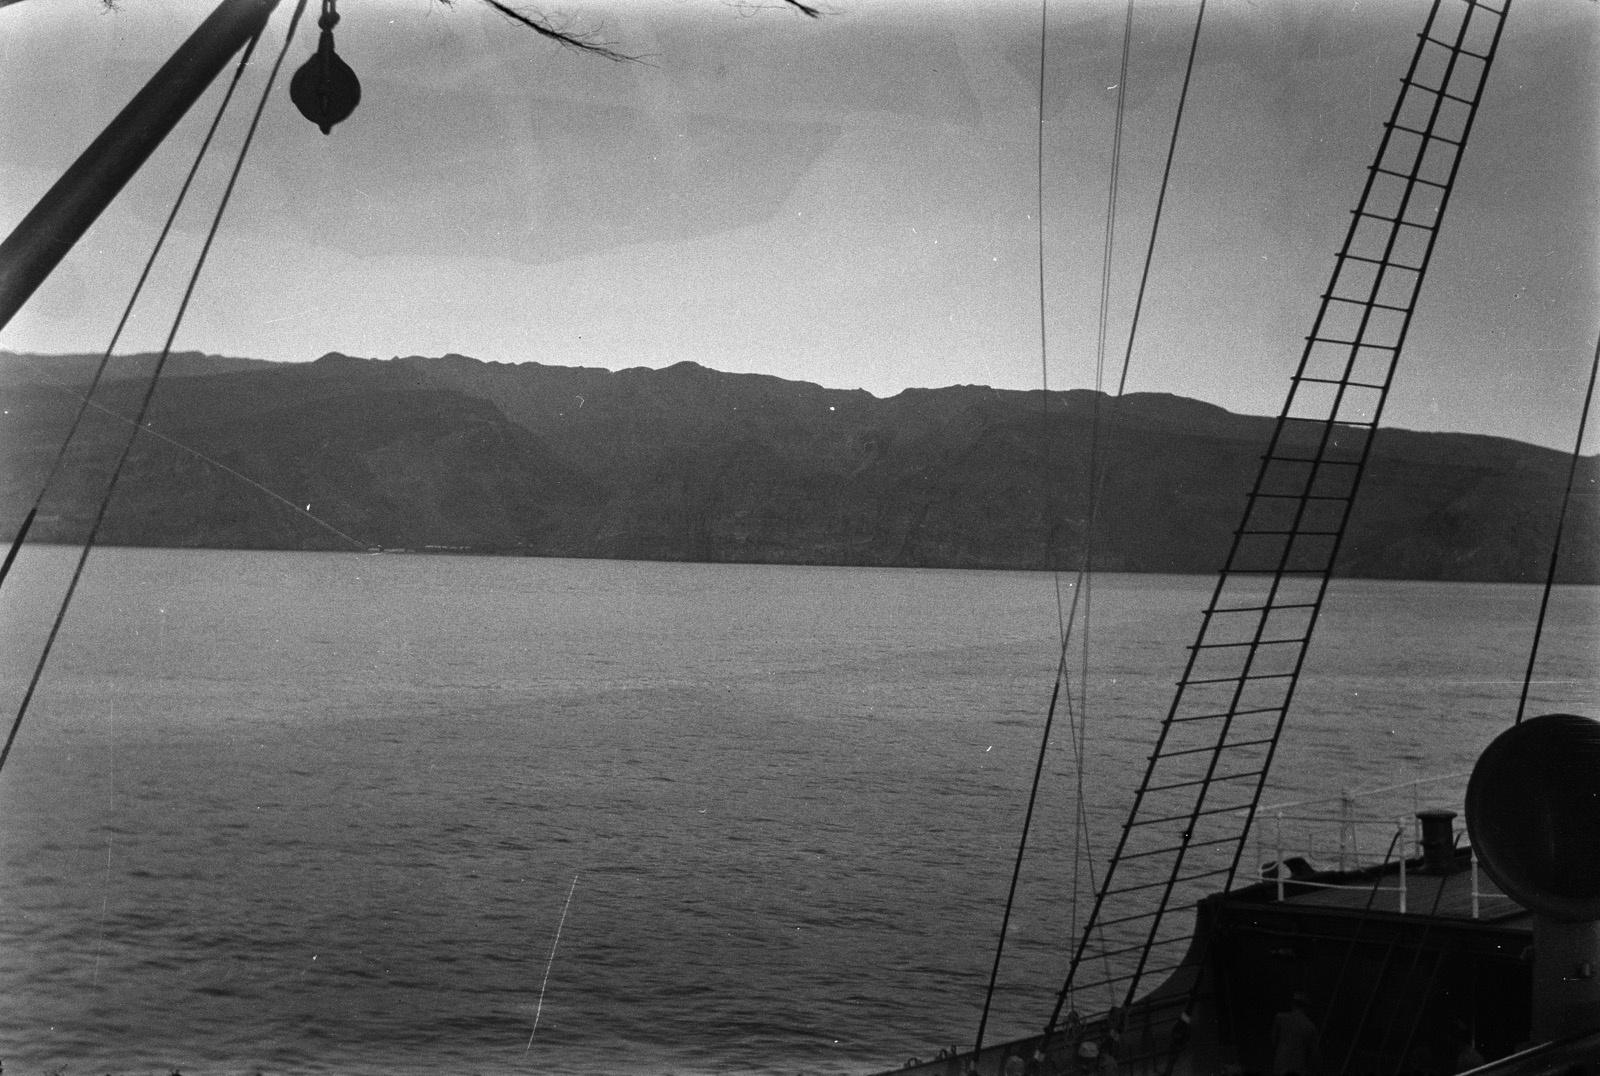 Путешествие Кейптаун-Мадейра. Вид на скалы острова Гомера